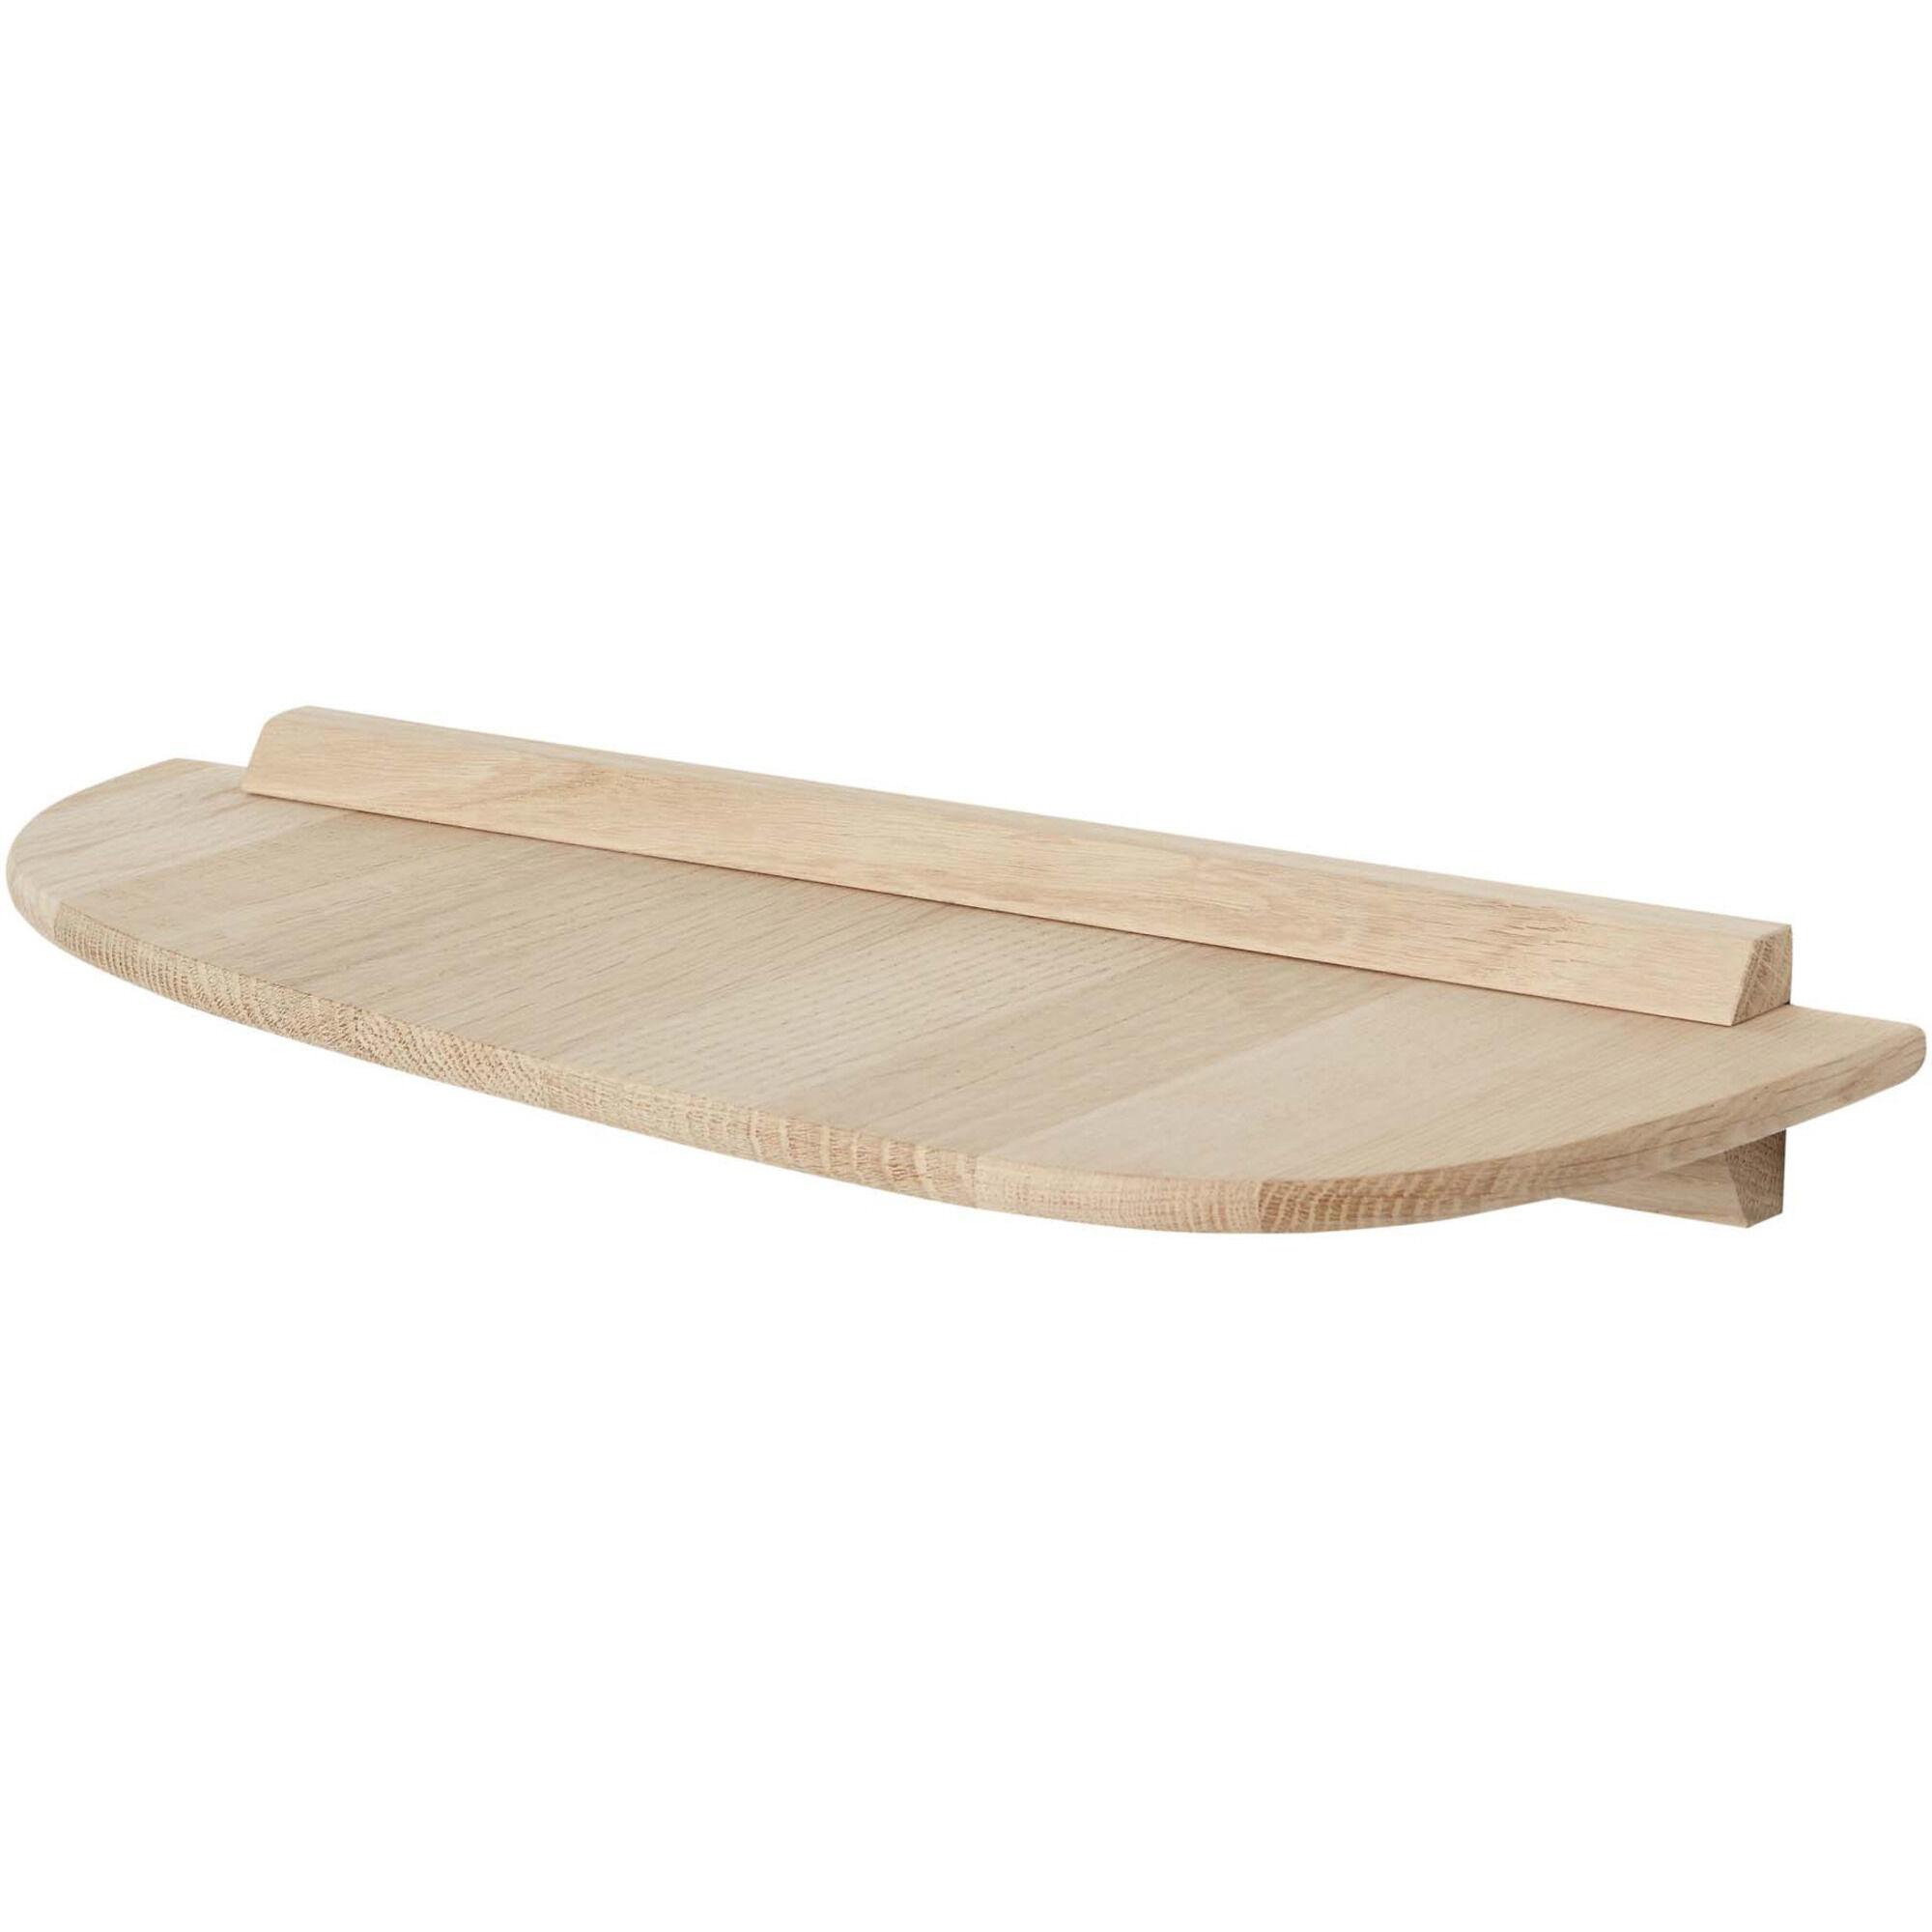 Andersen Furniture Shelf 1 40 x 18 cm Oak Hylle